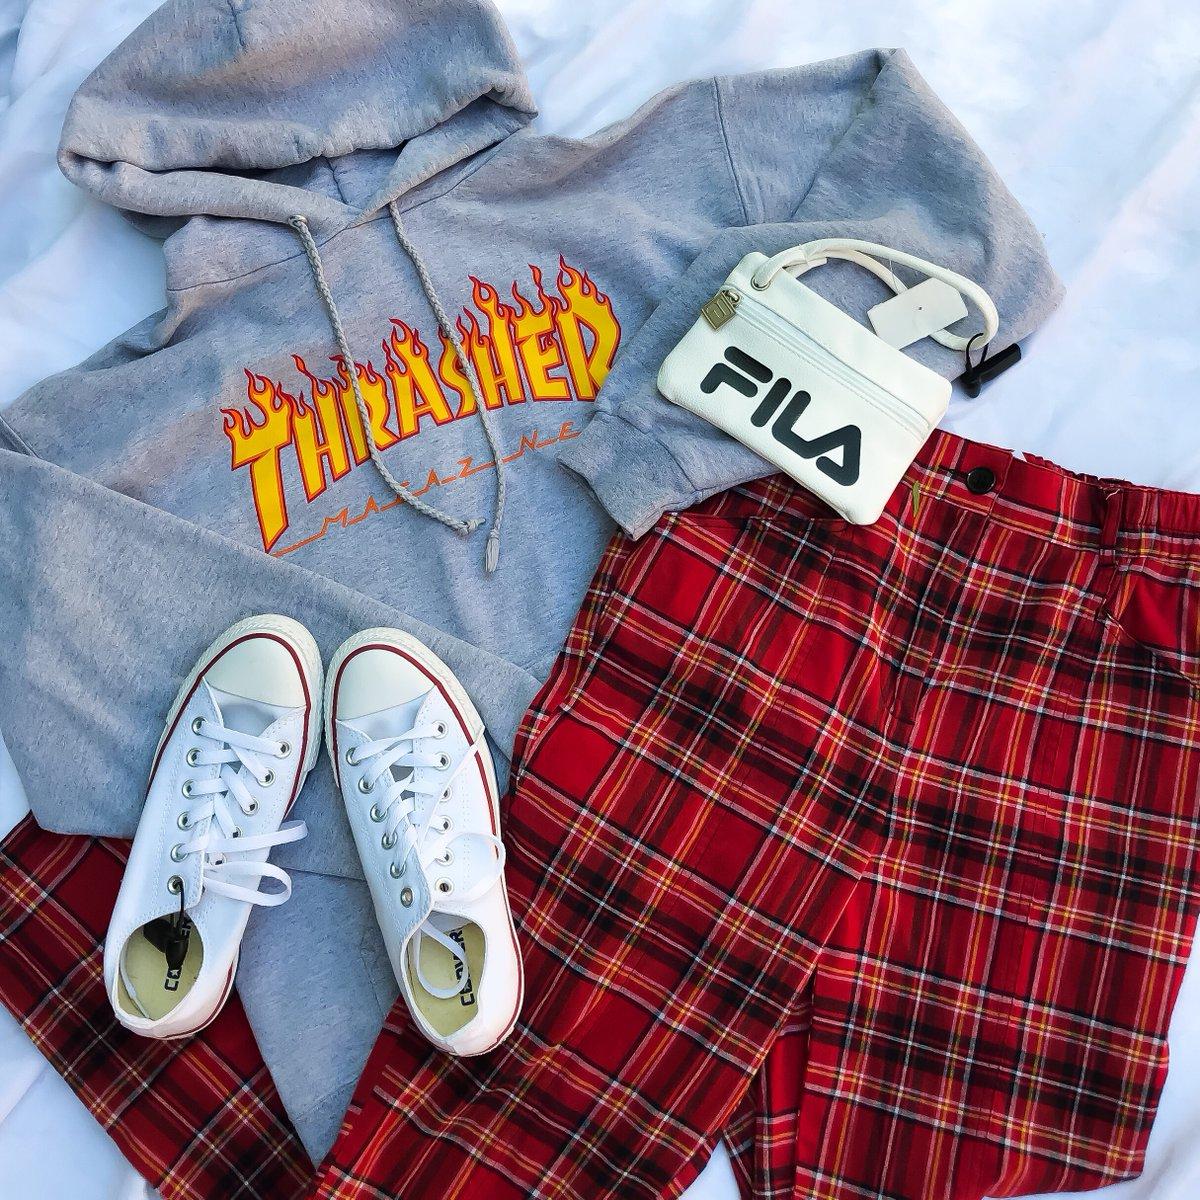 🔥  Thrasher Sweatshirt S $14  Urban Outfitters Pants S $14  Converse Womens Sneakers Size 6.5 $22 Fila Wallet $8   #platosclosettemecula #platosclosetstyle #thrasher #urbanoutfitters #ou #converse #fila #womensfashion #fallfashion #fallstyles #temecula #murrieta #lakeelsinore https://t.co/IotwQJ47ku